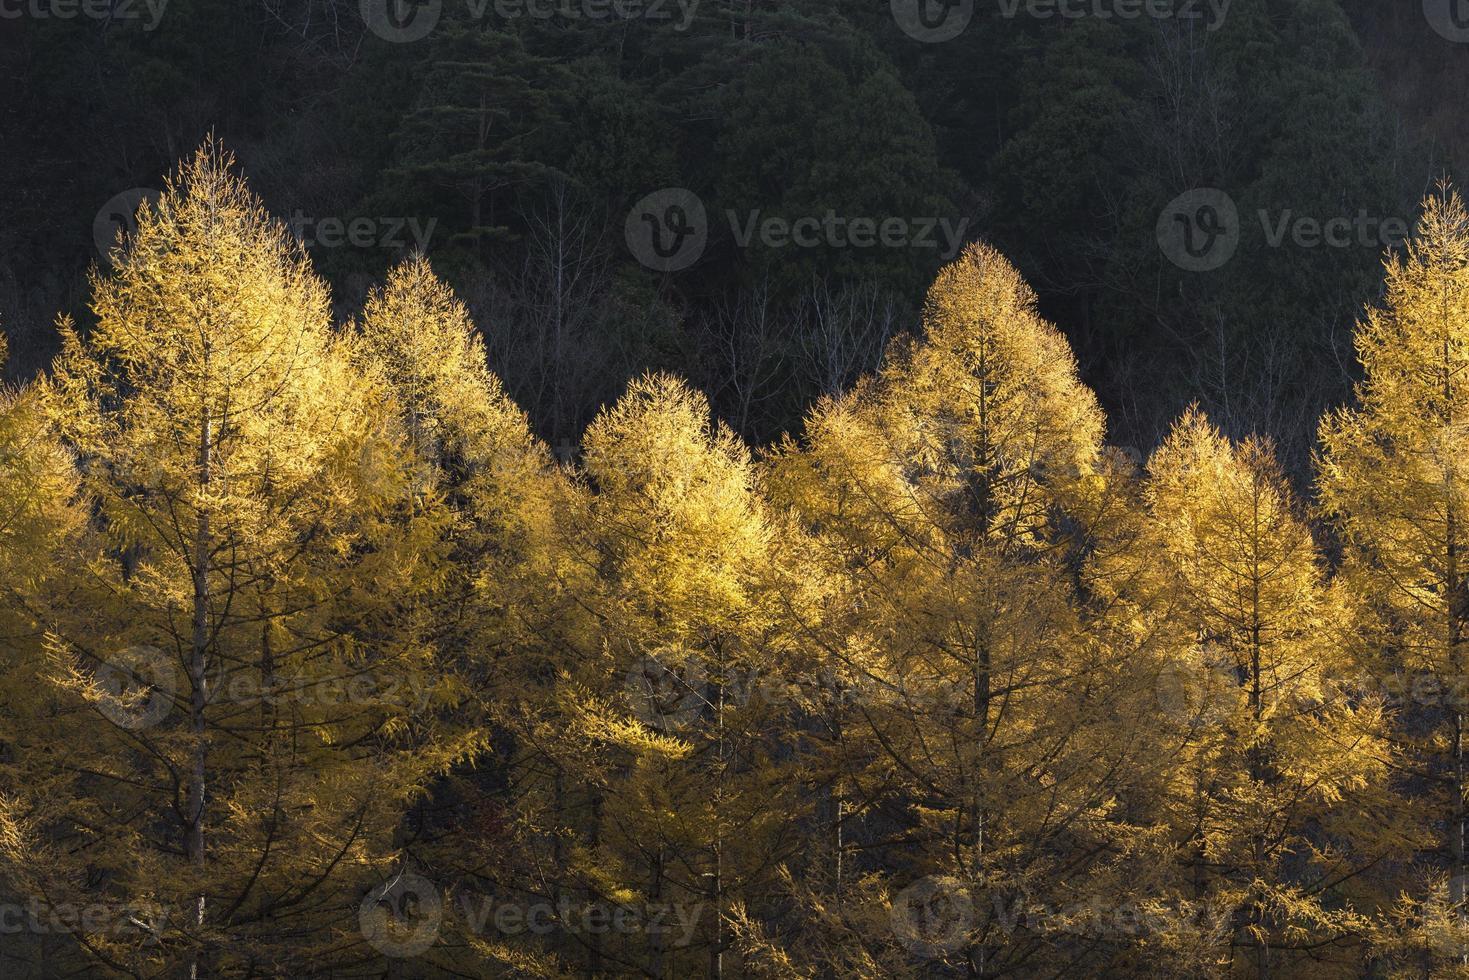 Bäume aus Herbstlaub. foto